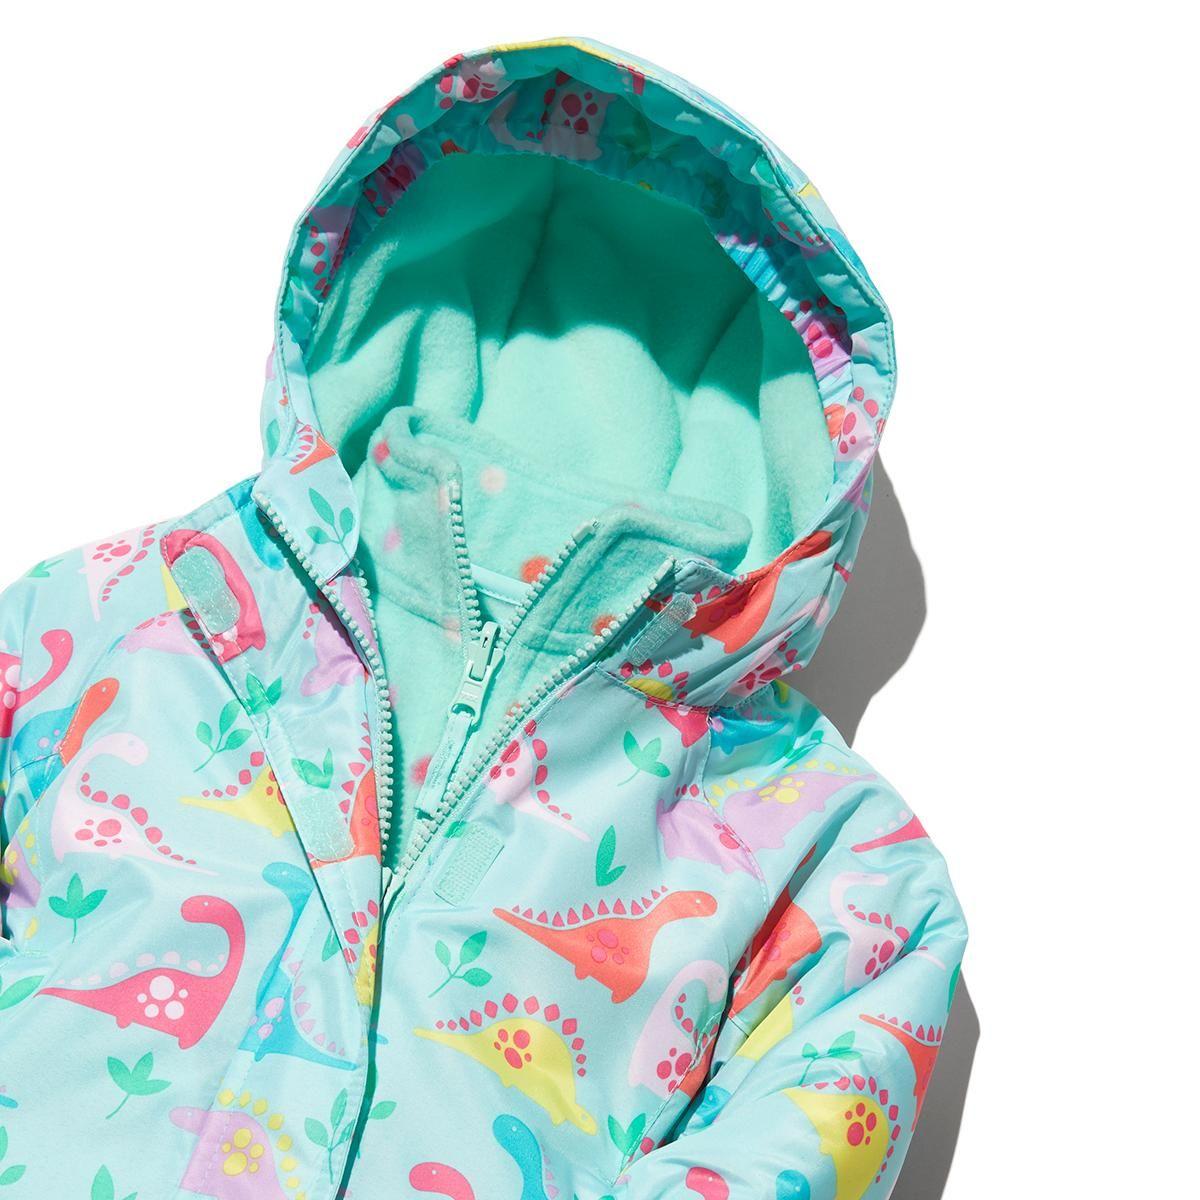 Girls 3 In 1 Dino Jacket Winter Essential Girls Jackets Kids Baby Coats Girl Fashion [ 1200 x 1200 Pixel ]